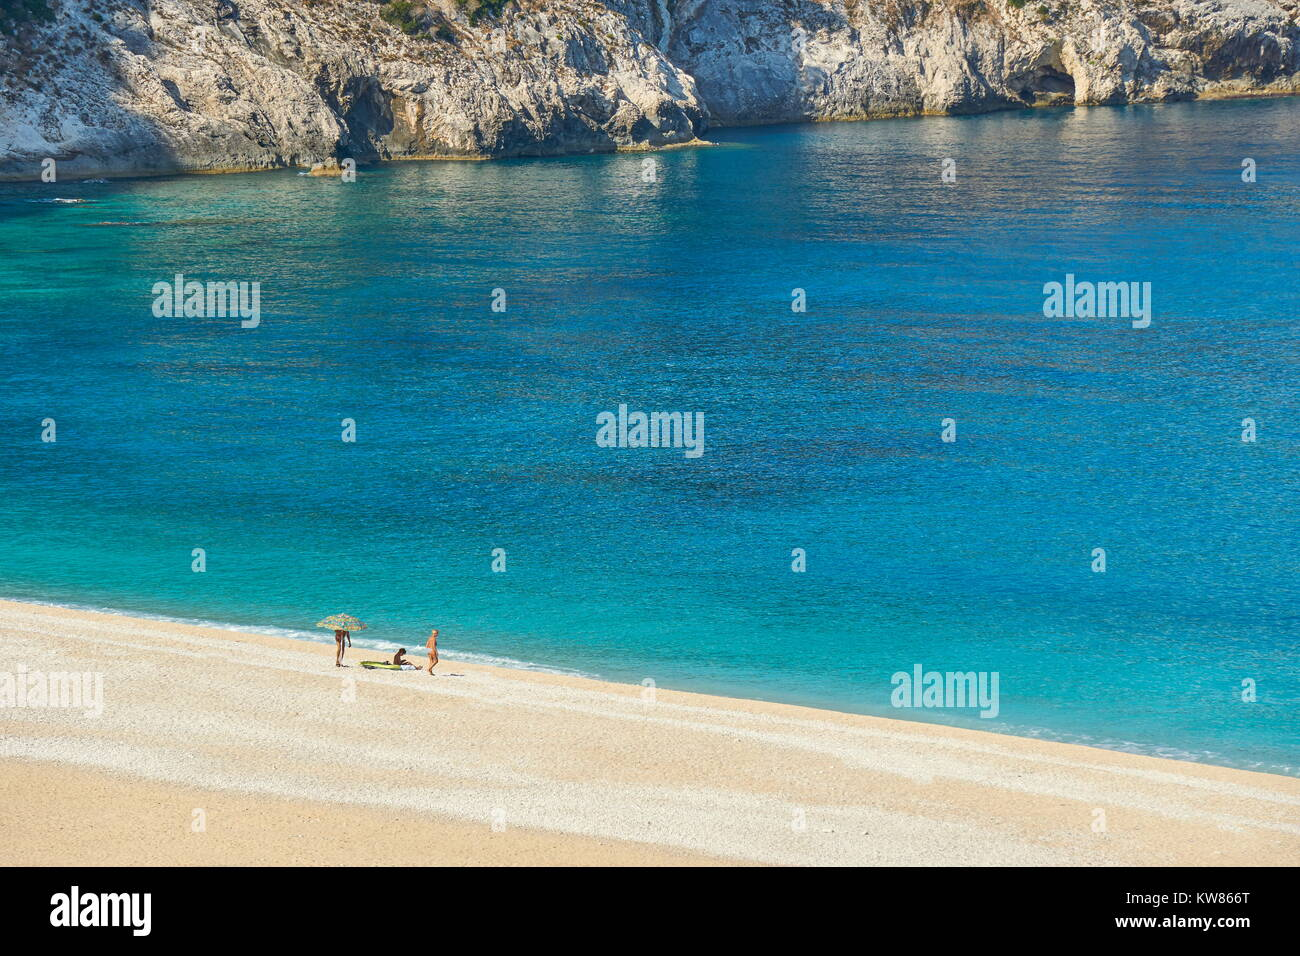 Greece - Myrtos Beach, Kefalonia (Cephalonia), Greek Ionian Islands Stock Photo